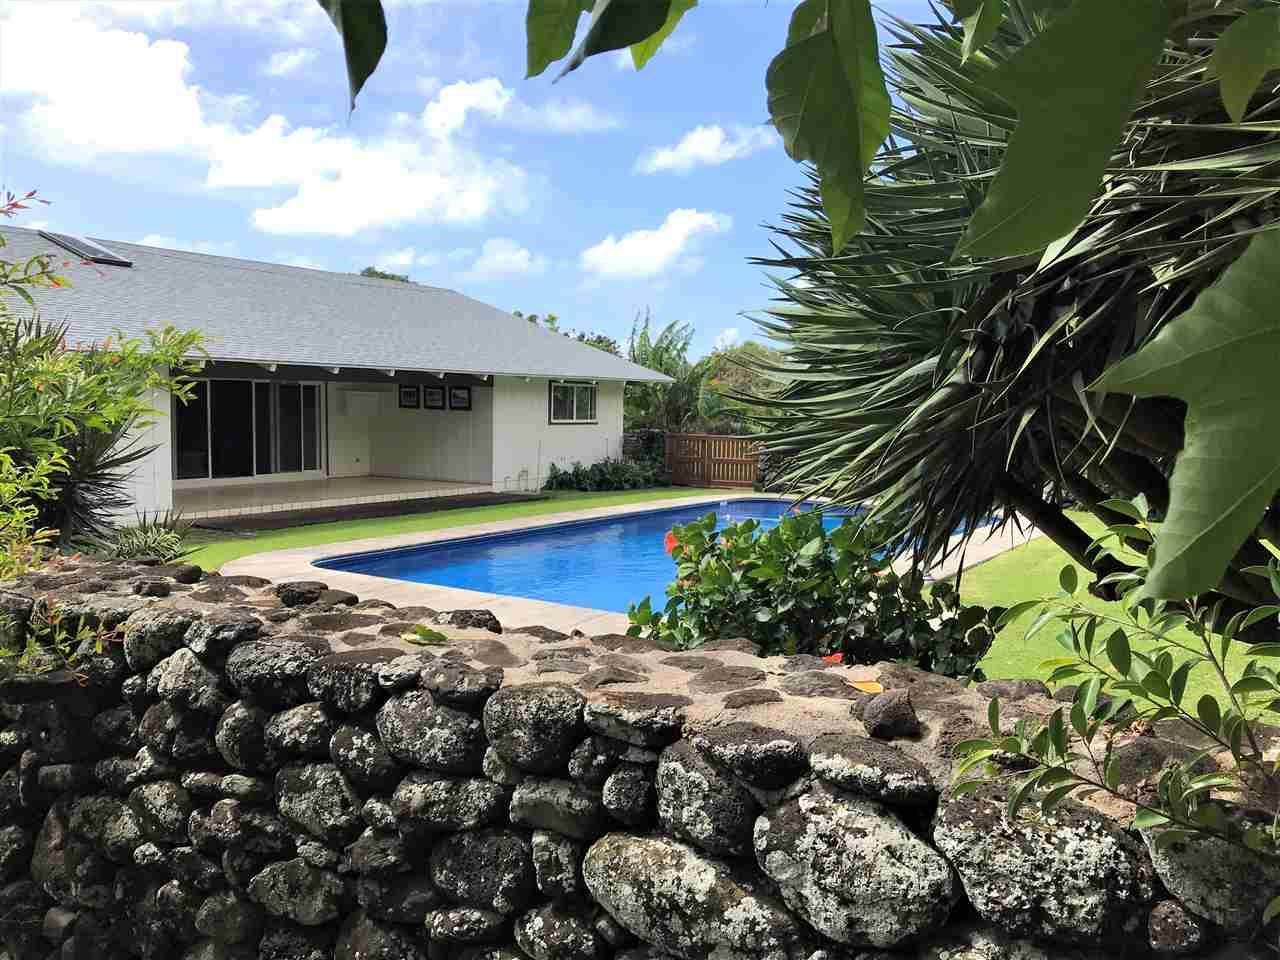 Photo of 8391 Kamehameha V Hwy, Kaunakakai, HI 96748 (MLS # 386344)